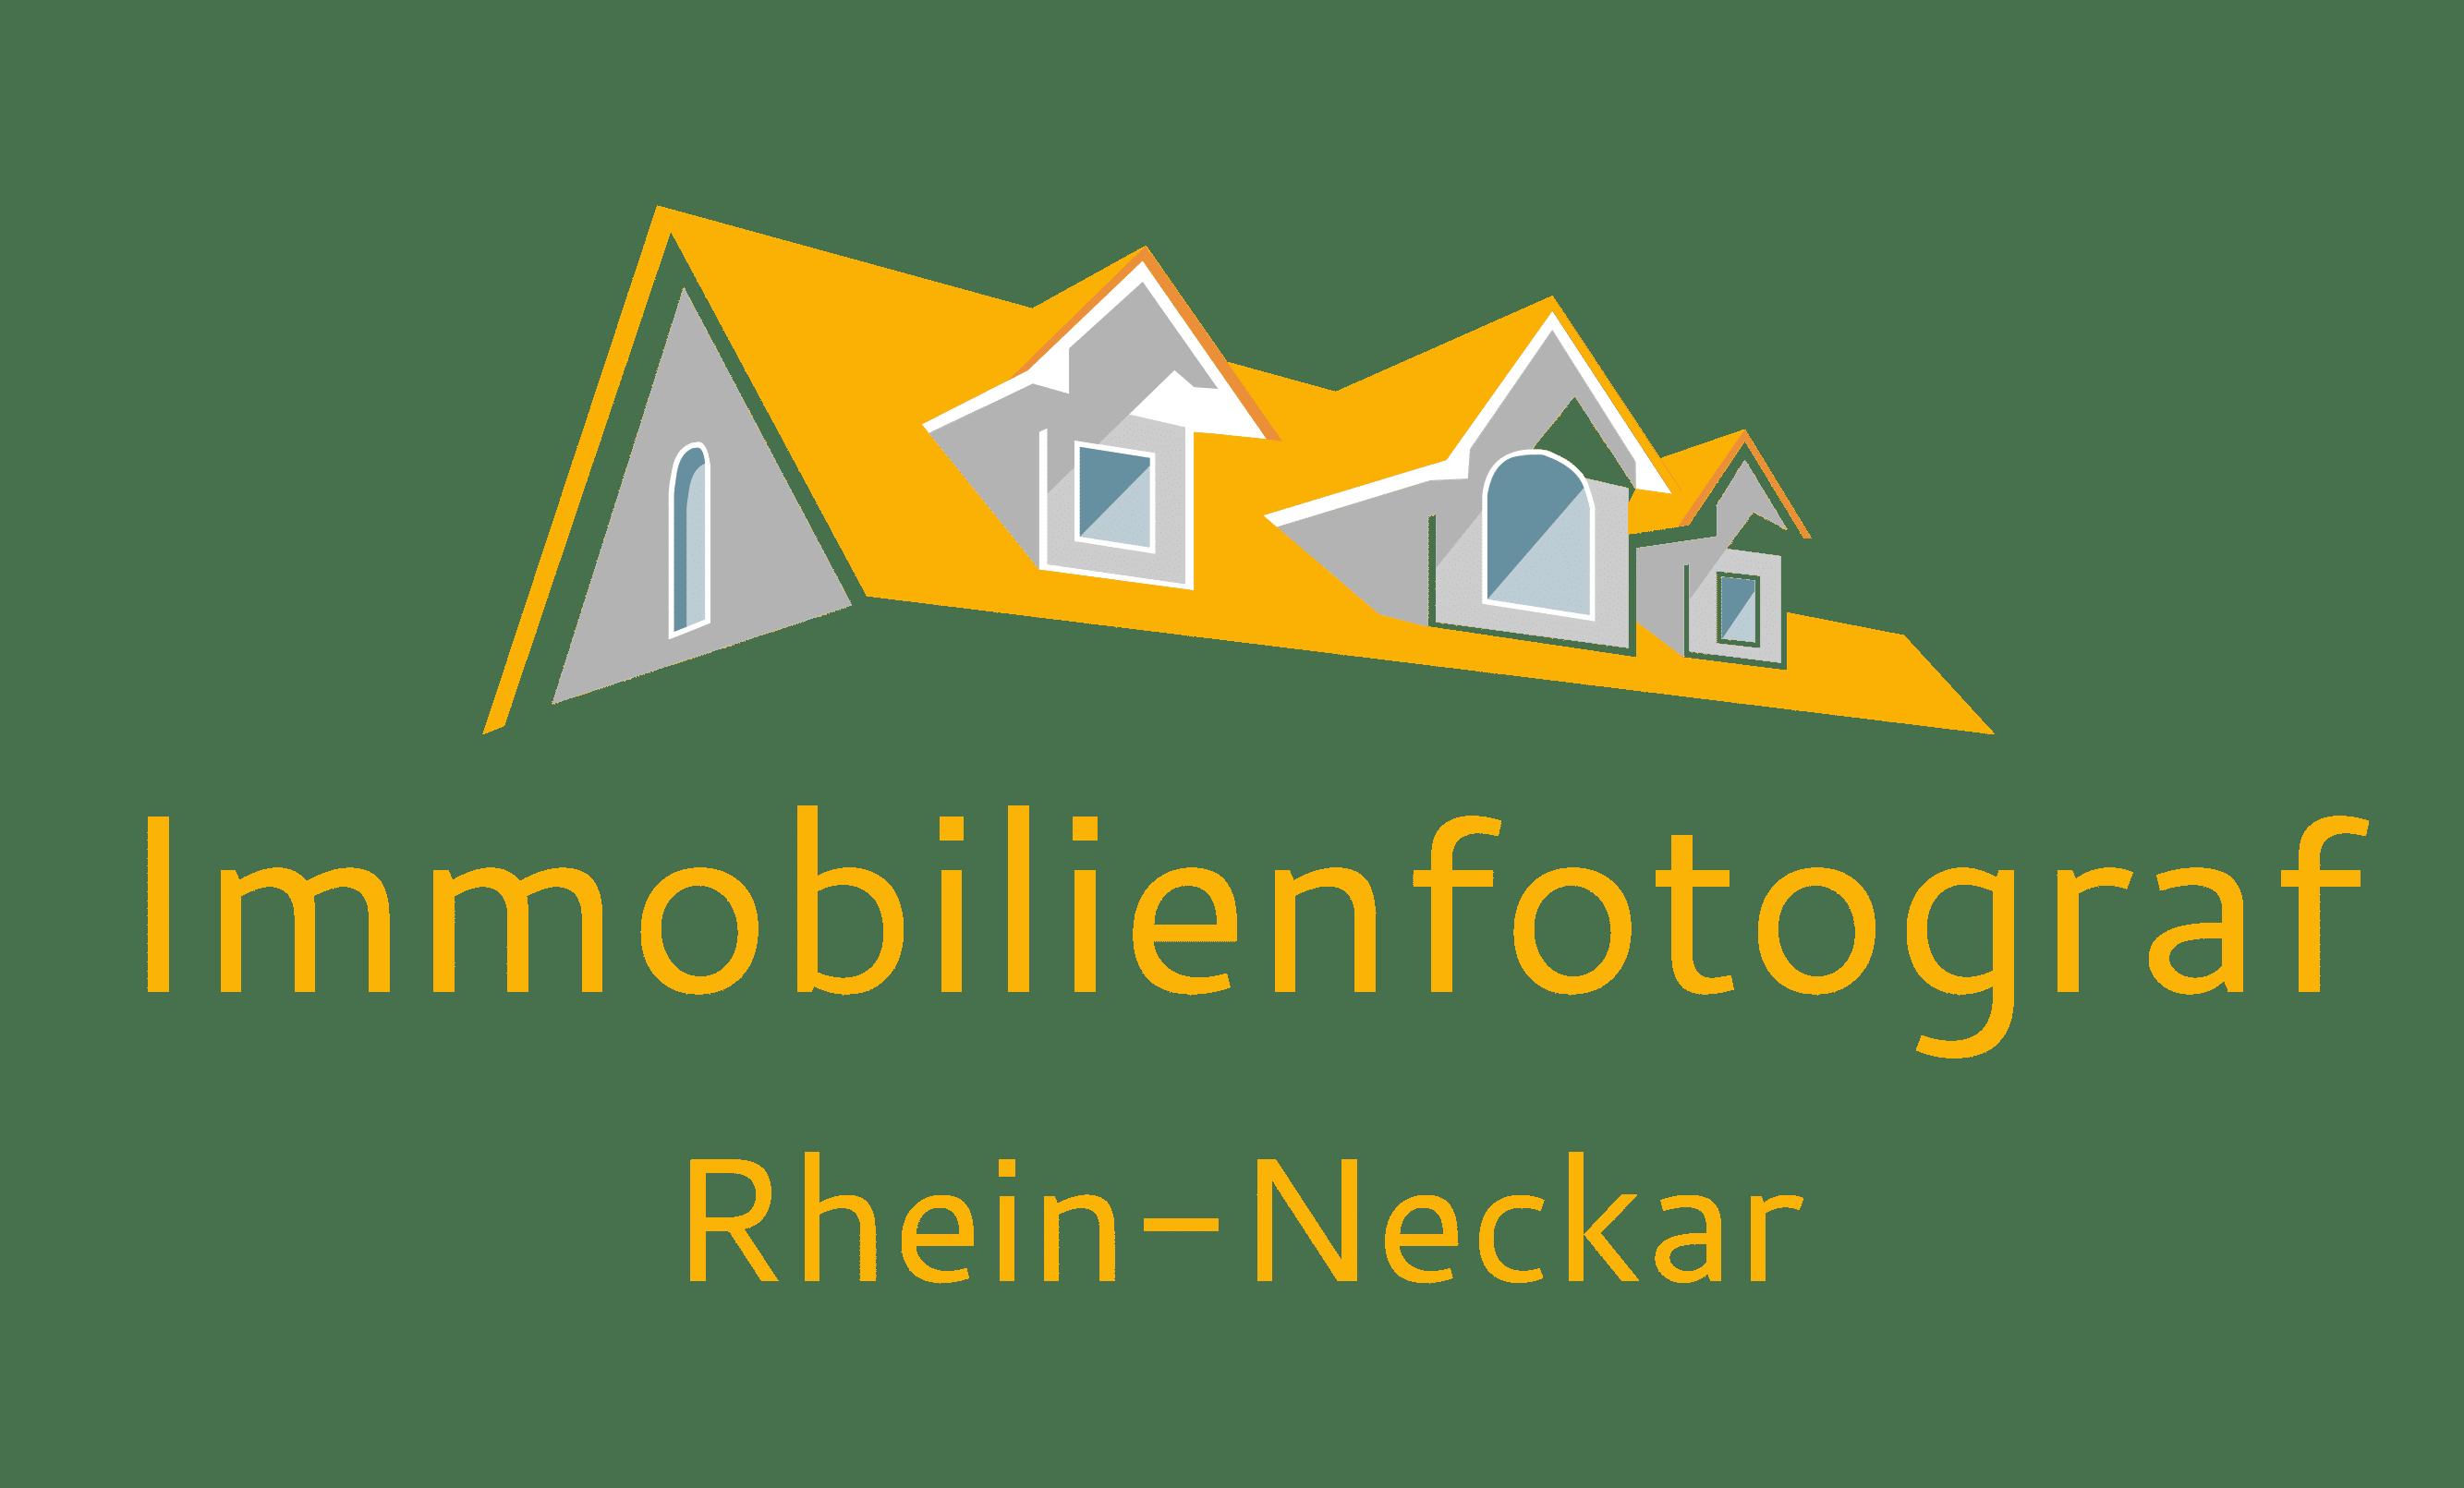 Immobilienfotograf Rhein Neckar